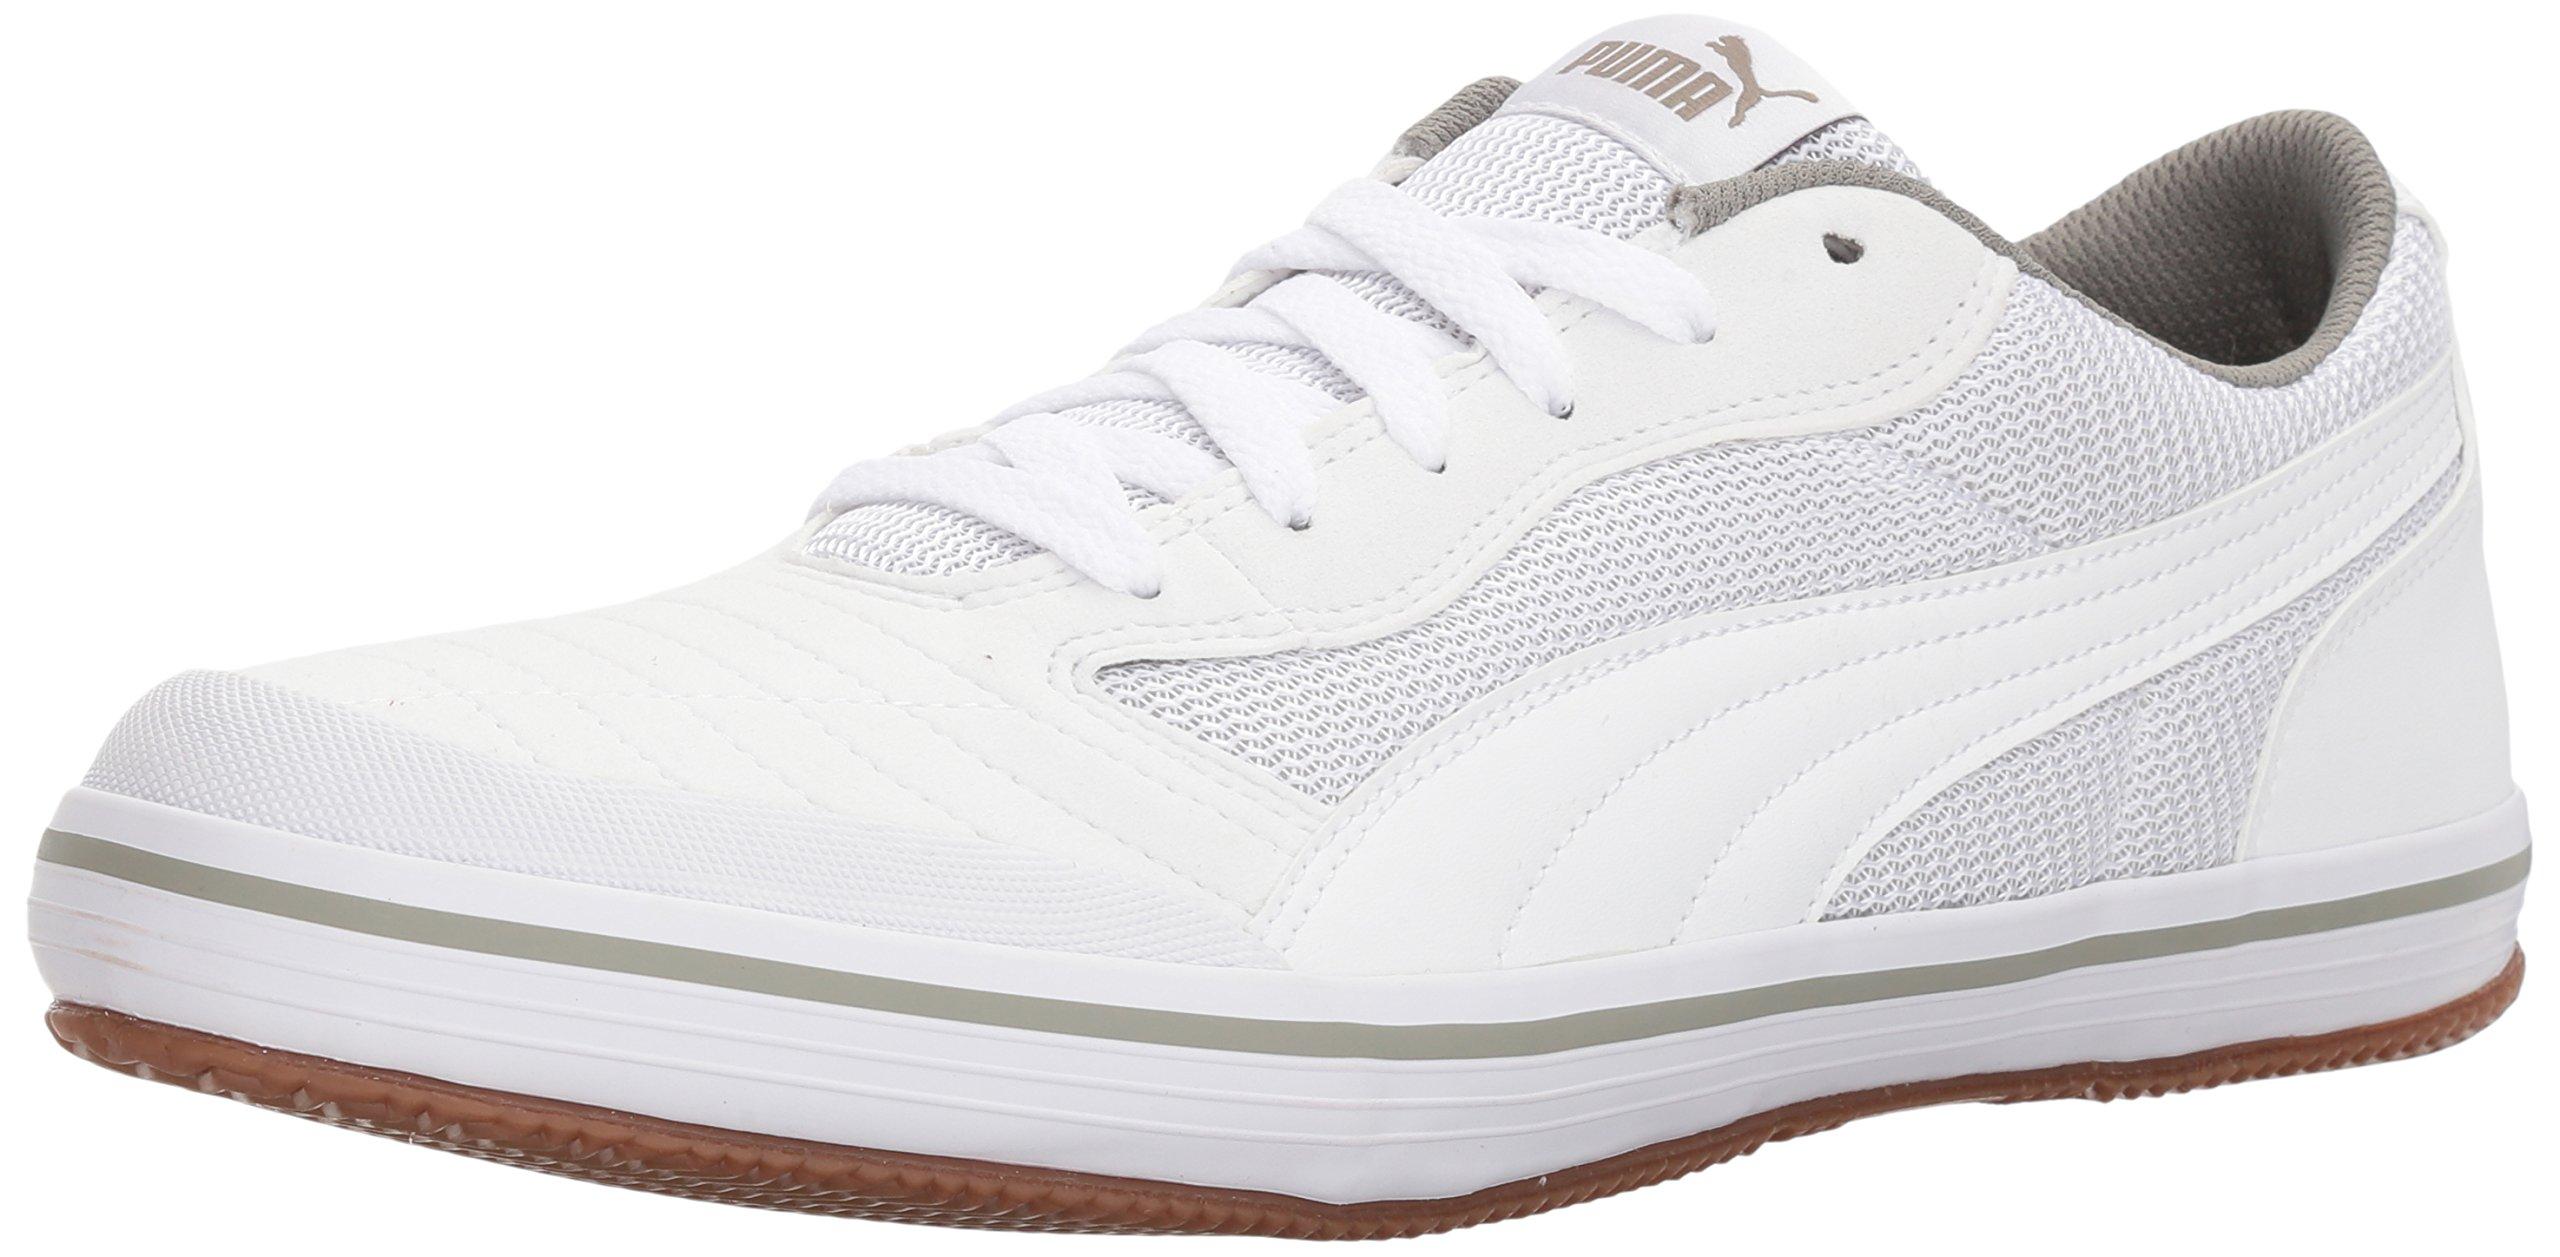 PUMA Men's Astro Sala Sneaker, White White, 10.5 M US by PUMA